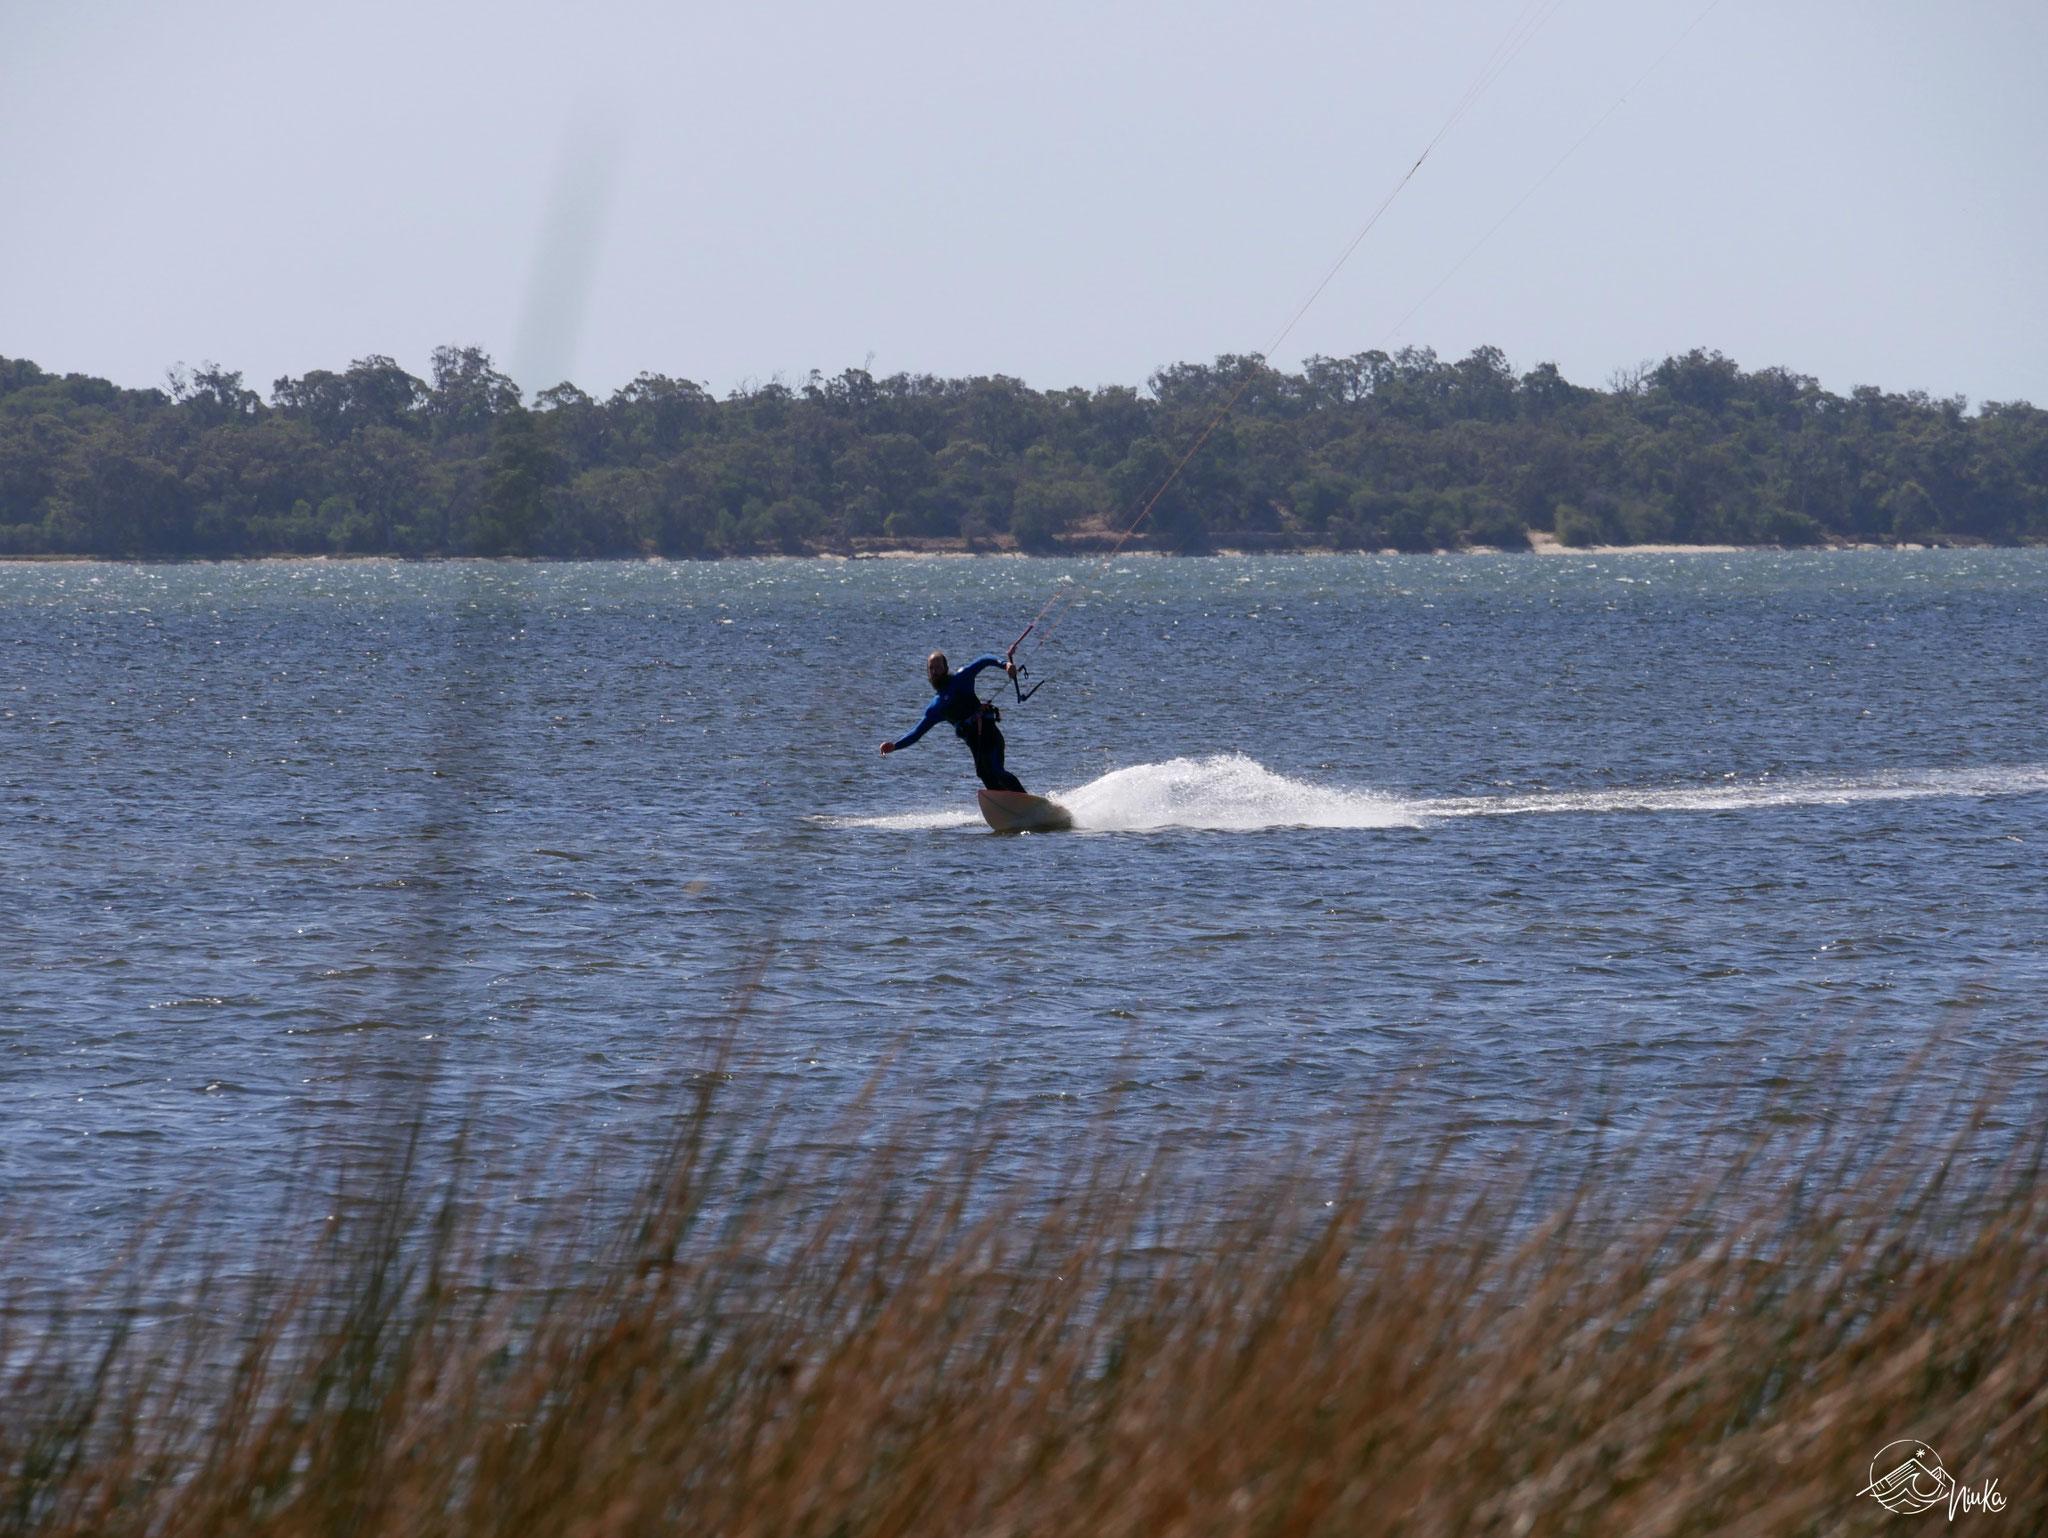 Kitesurfen in Australind